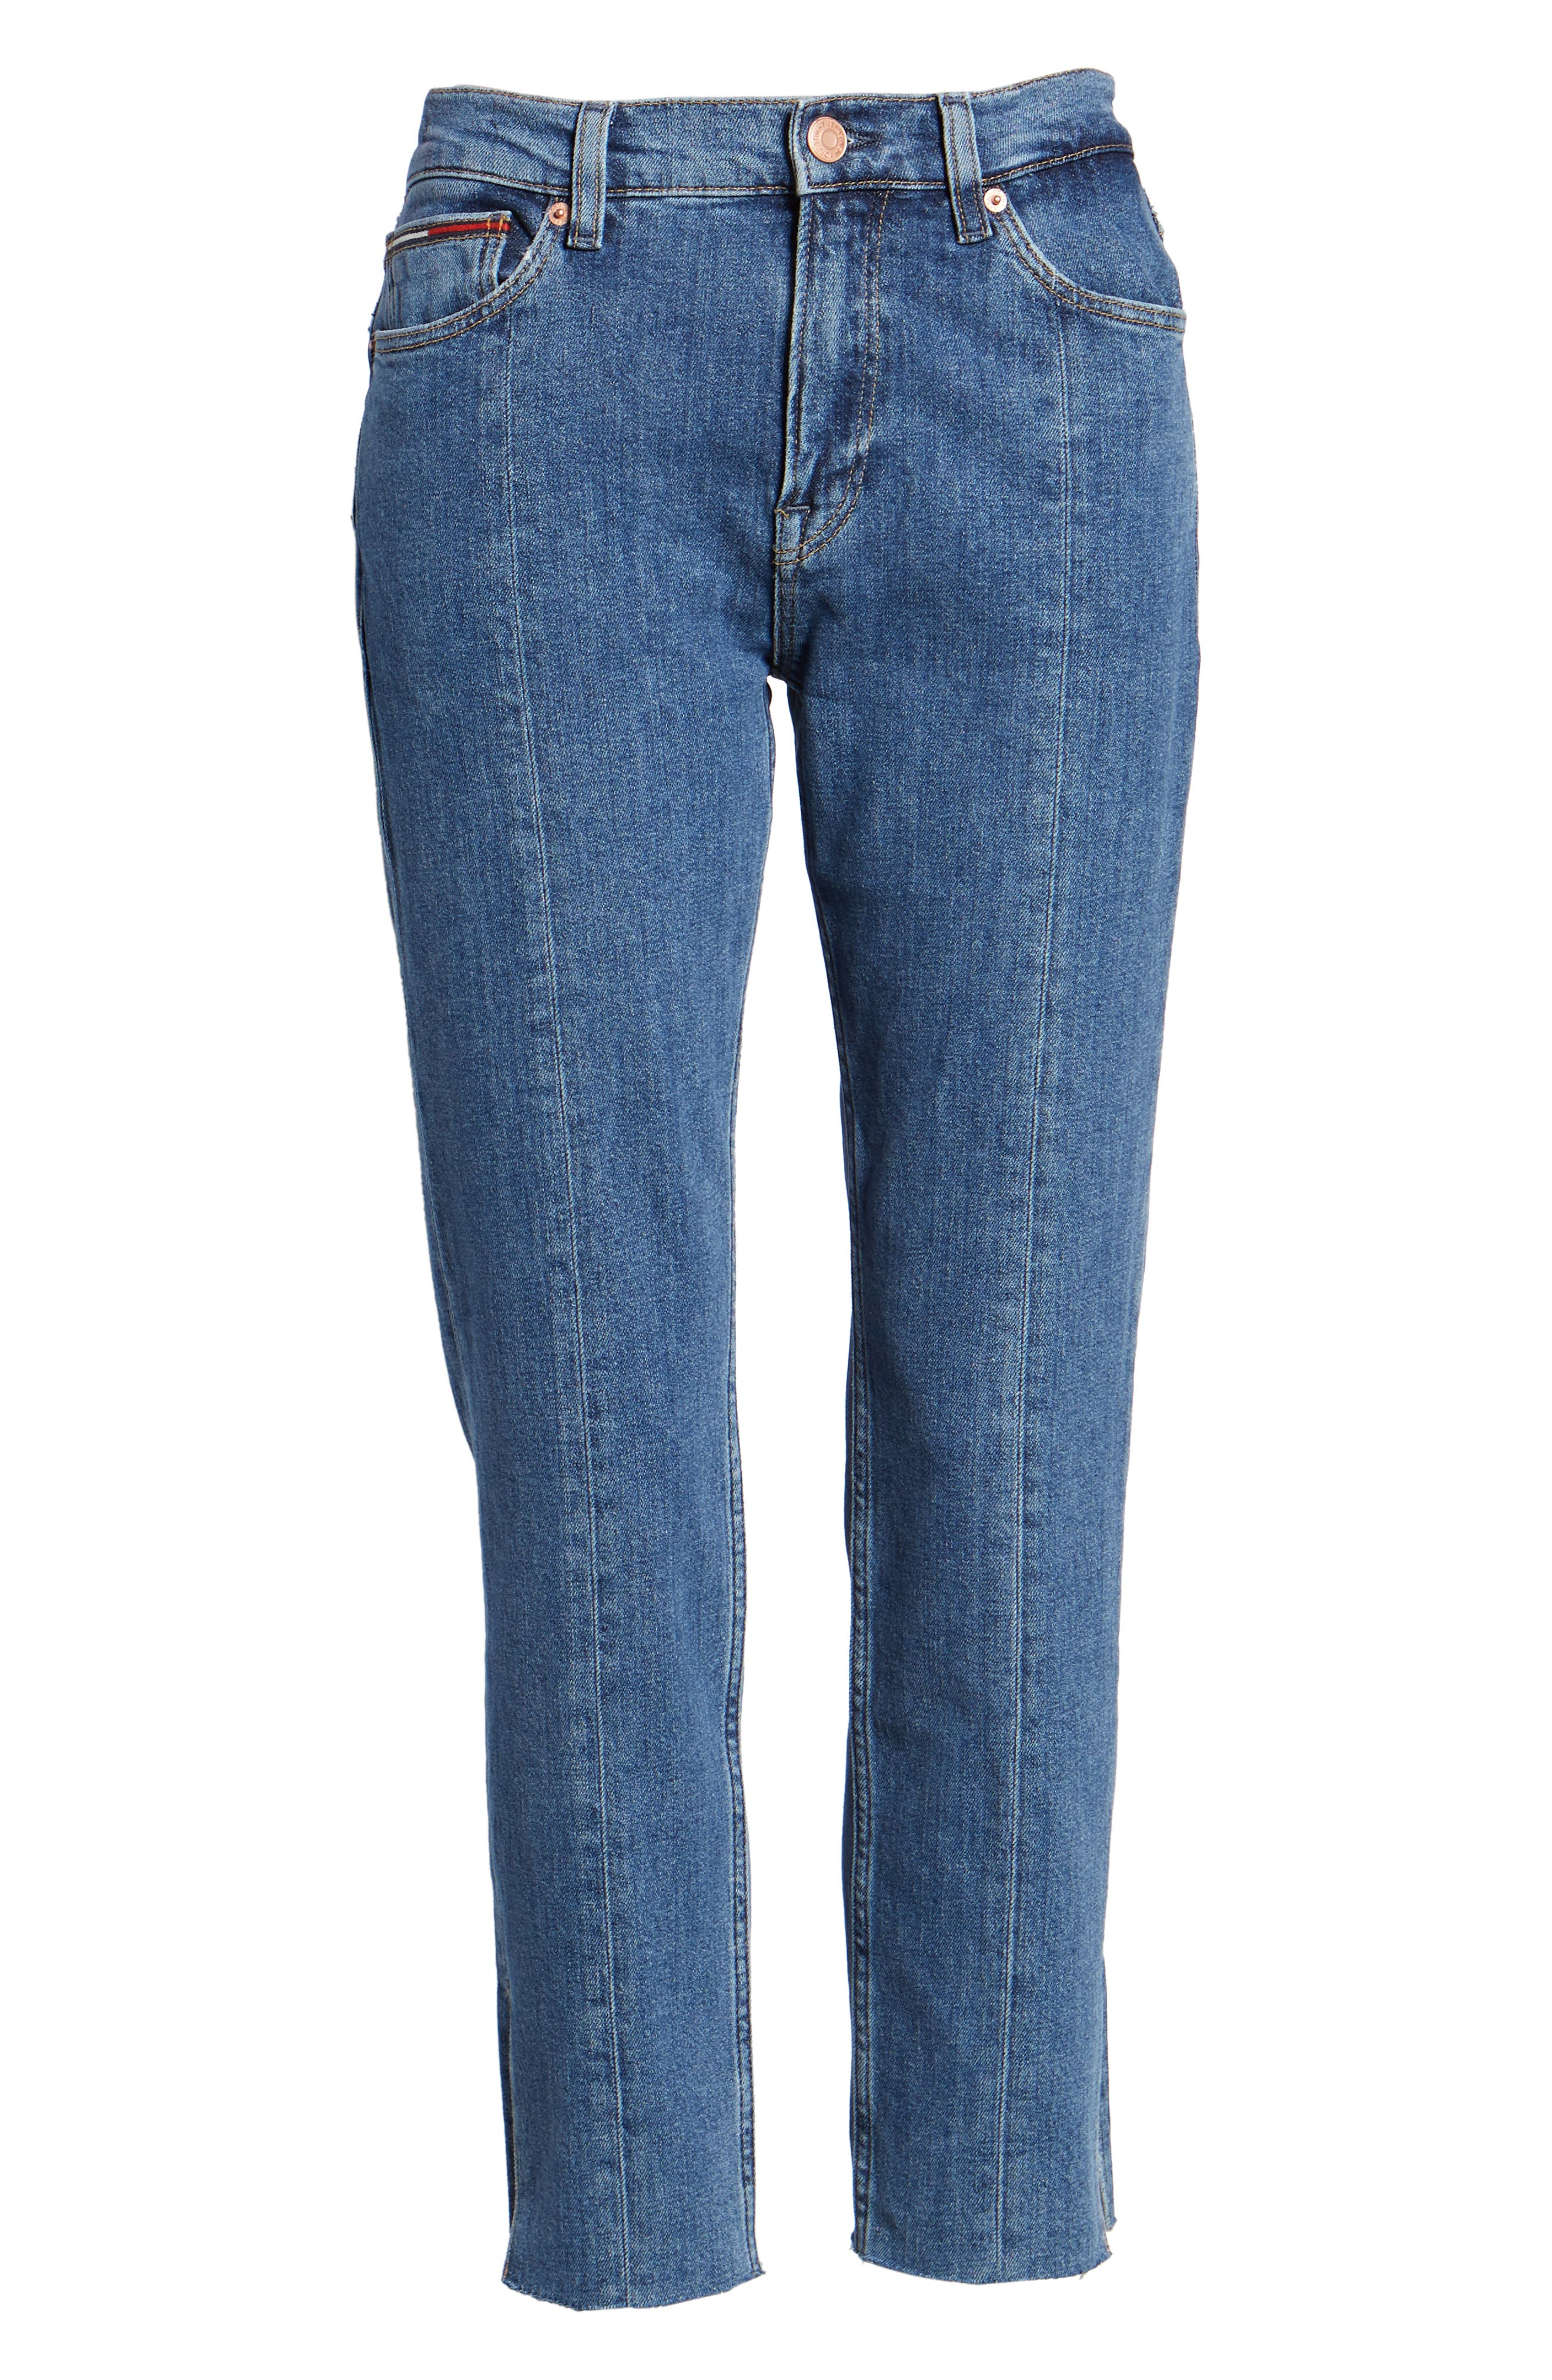 Izzy High Rise Center Seam Slim Jeans,                             Alternate thumbnail 6, color,                             400